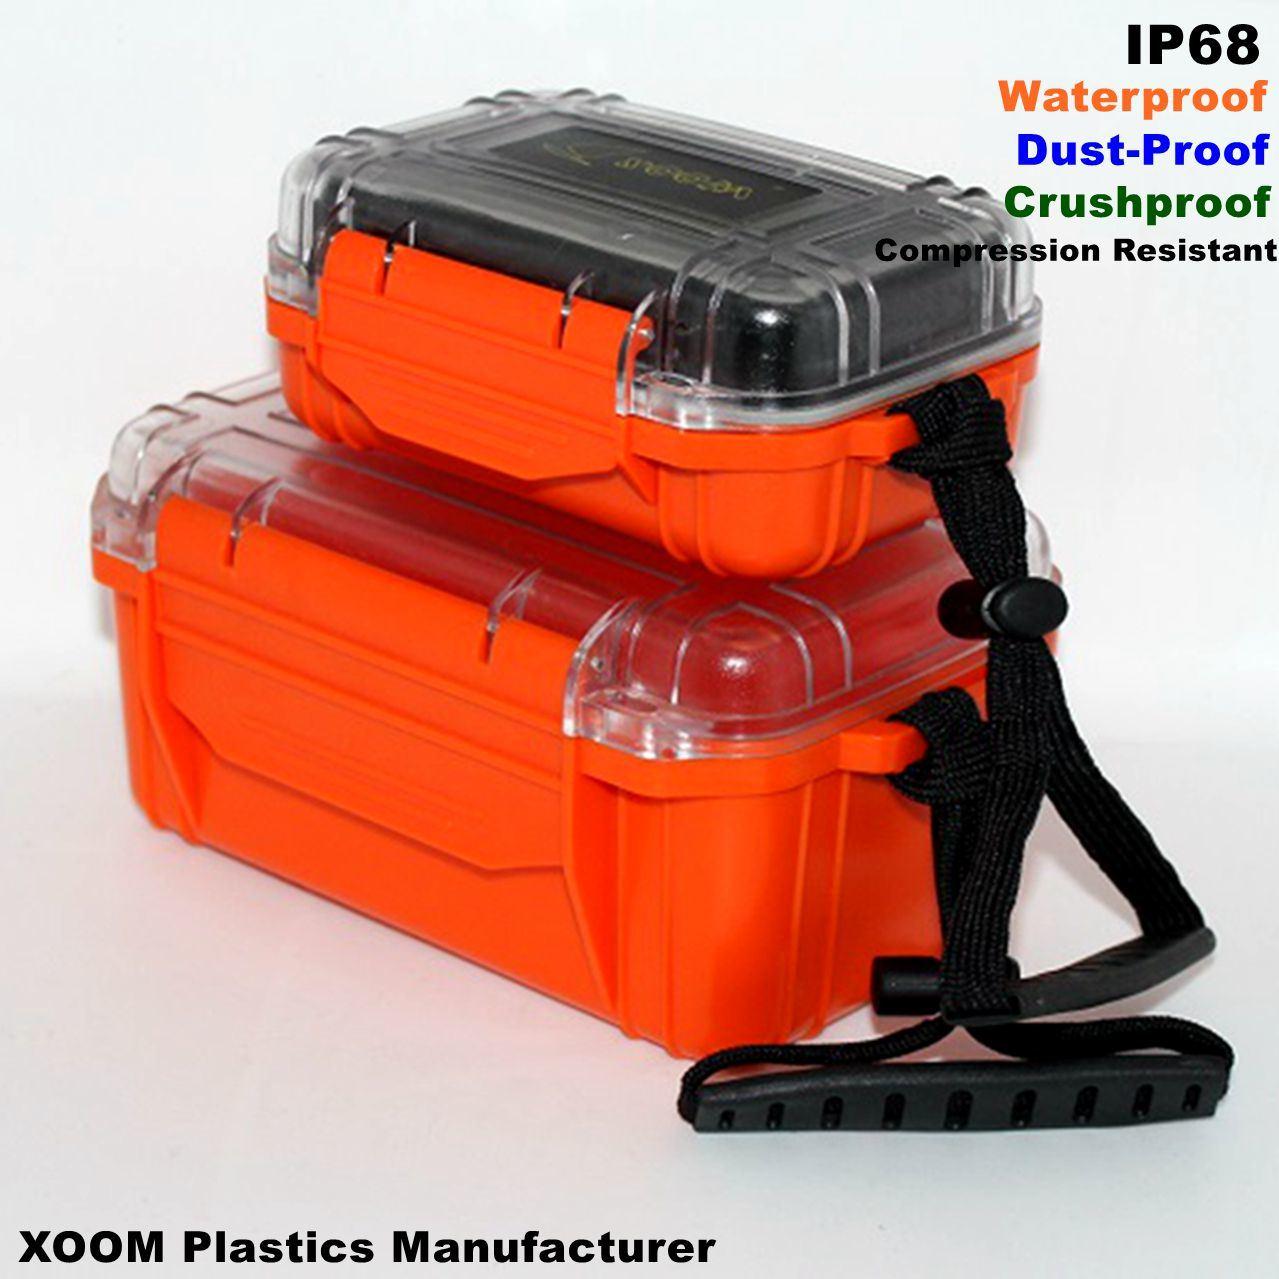 Small Dry Box-Watersports Guard Waterproof Cellphone Box